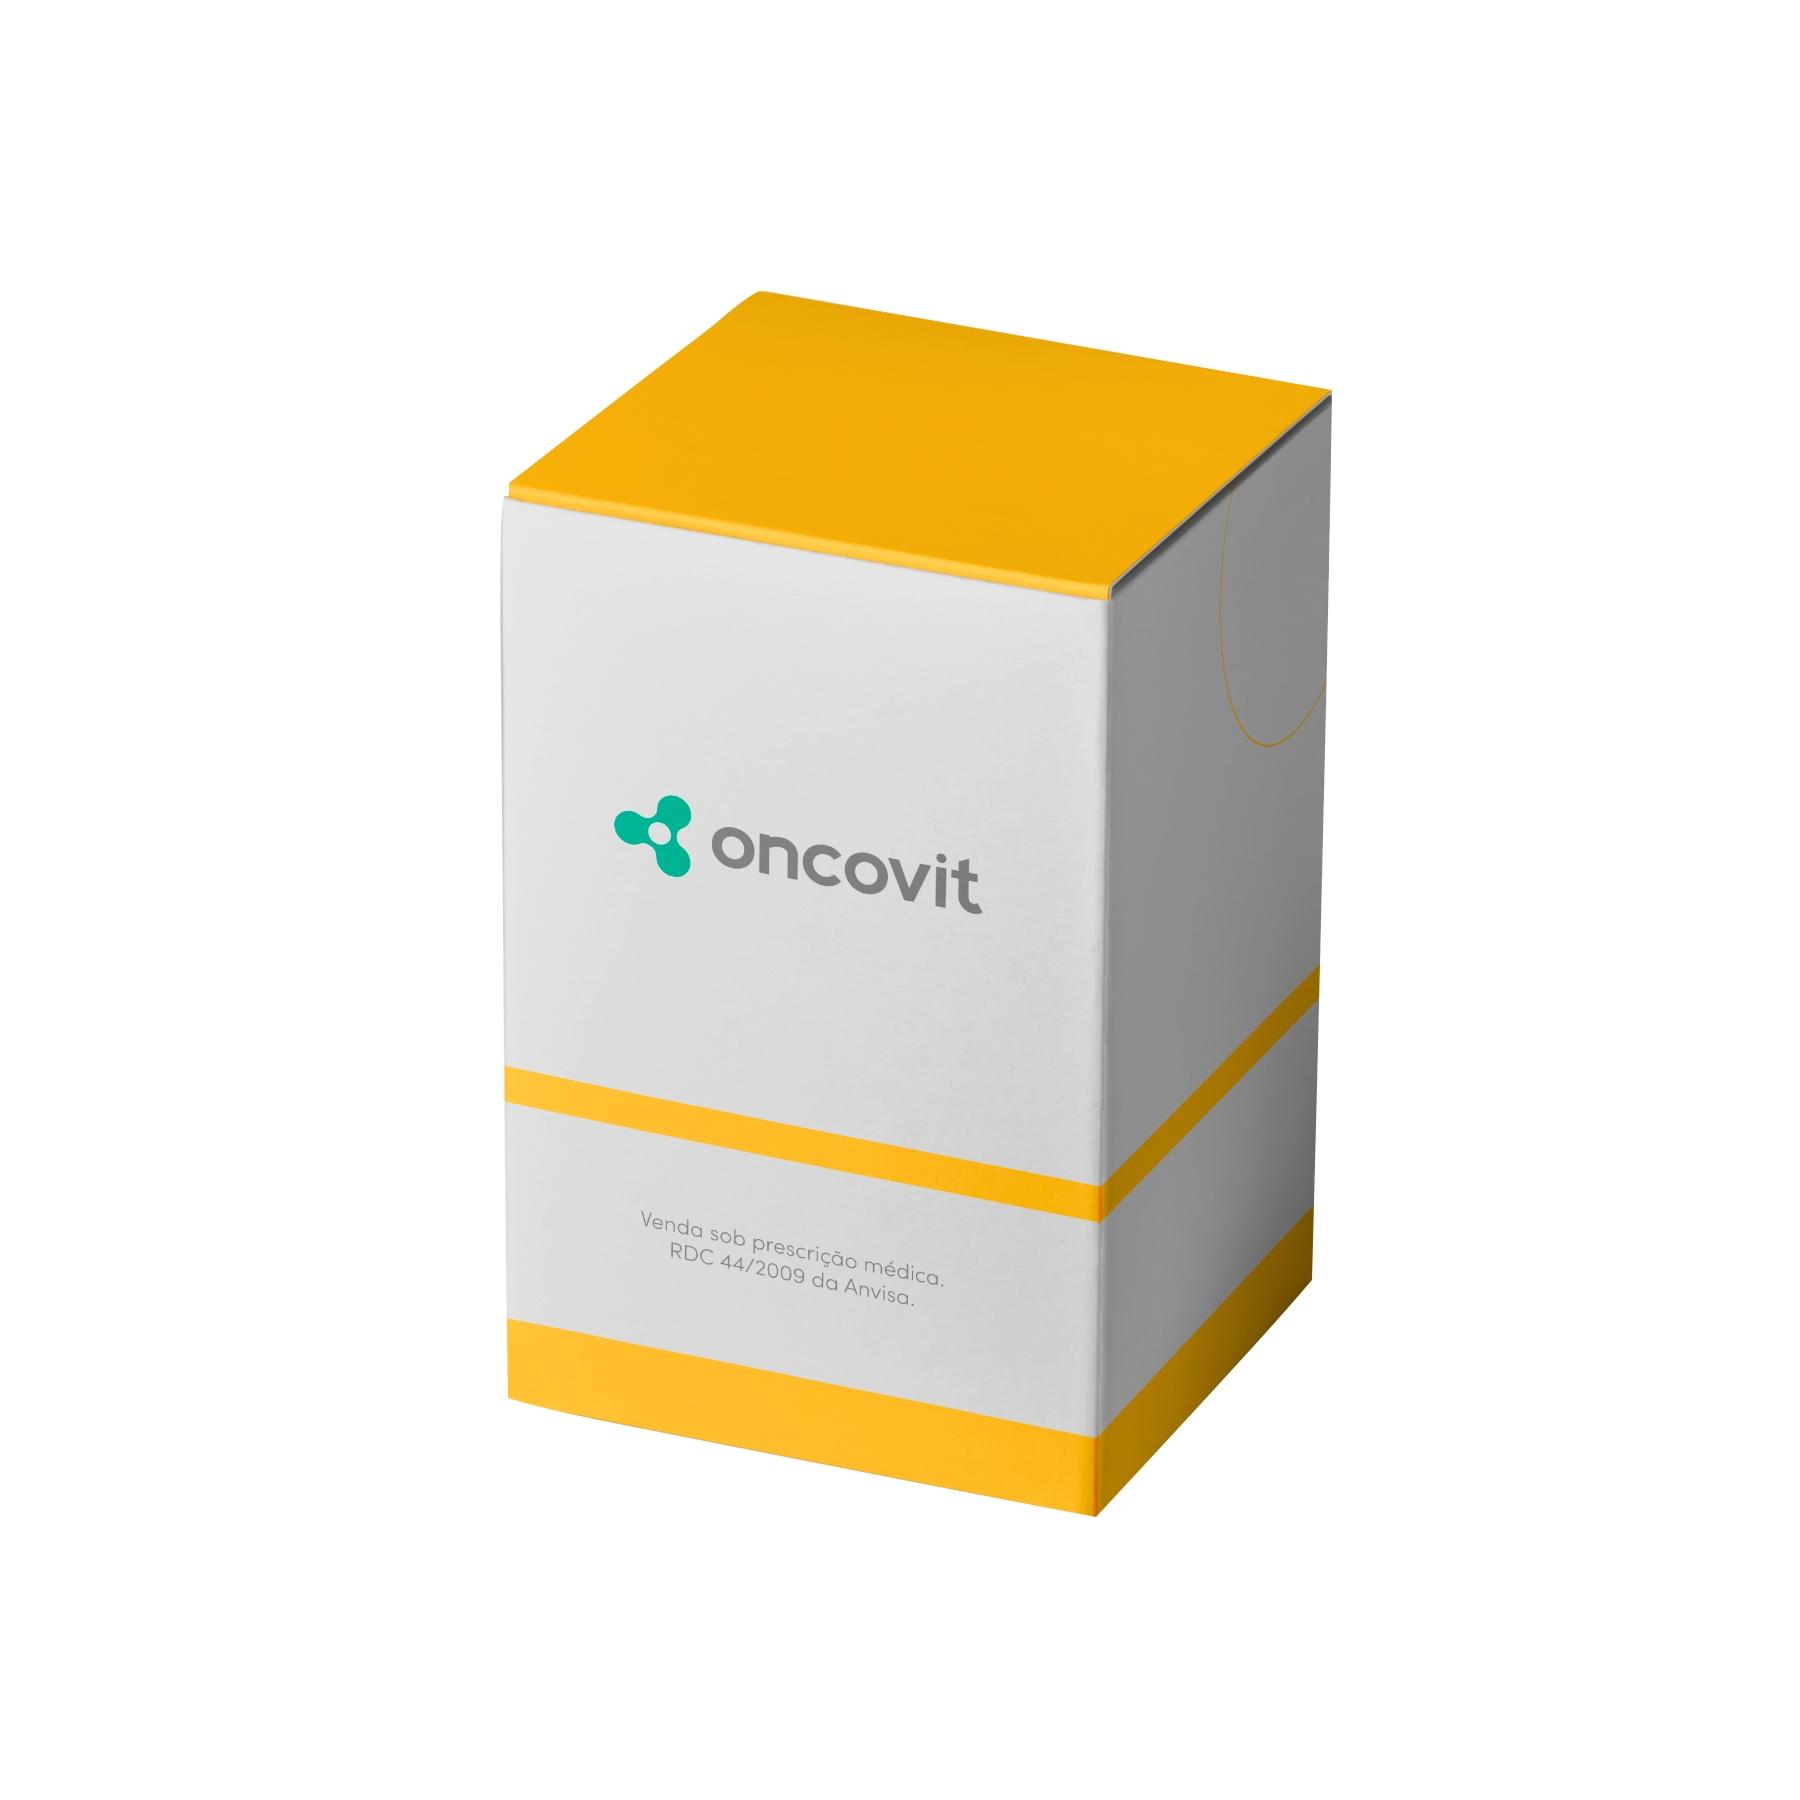 Acetato de Abiraterona 250mg caixa com 120 comprimidos